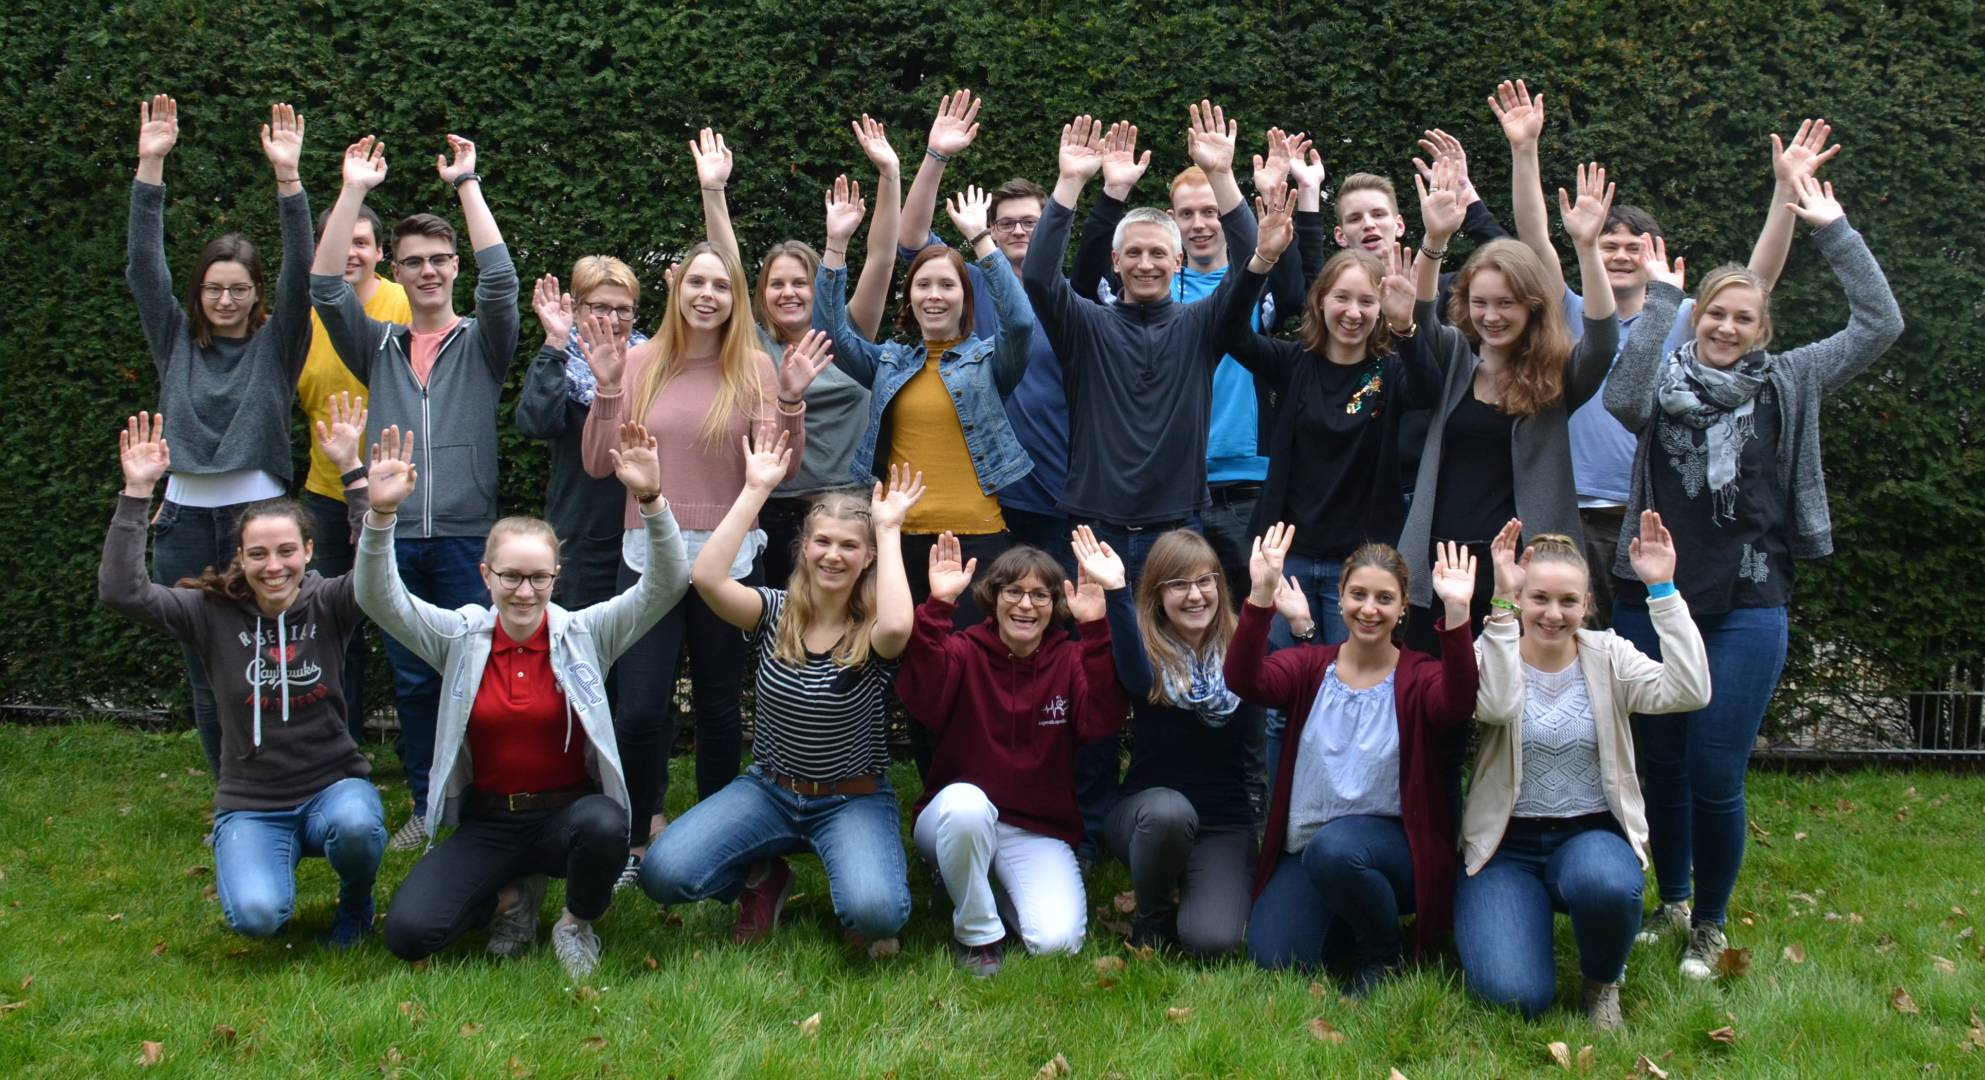 Gruppenfoto Jugendleiter-Basismodul 2018